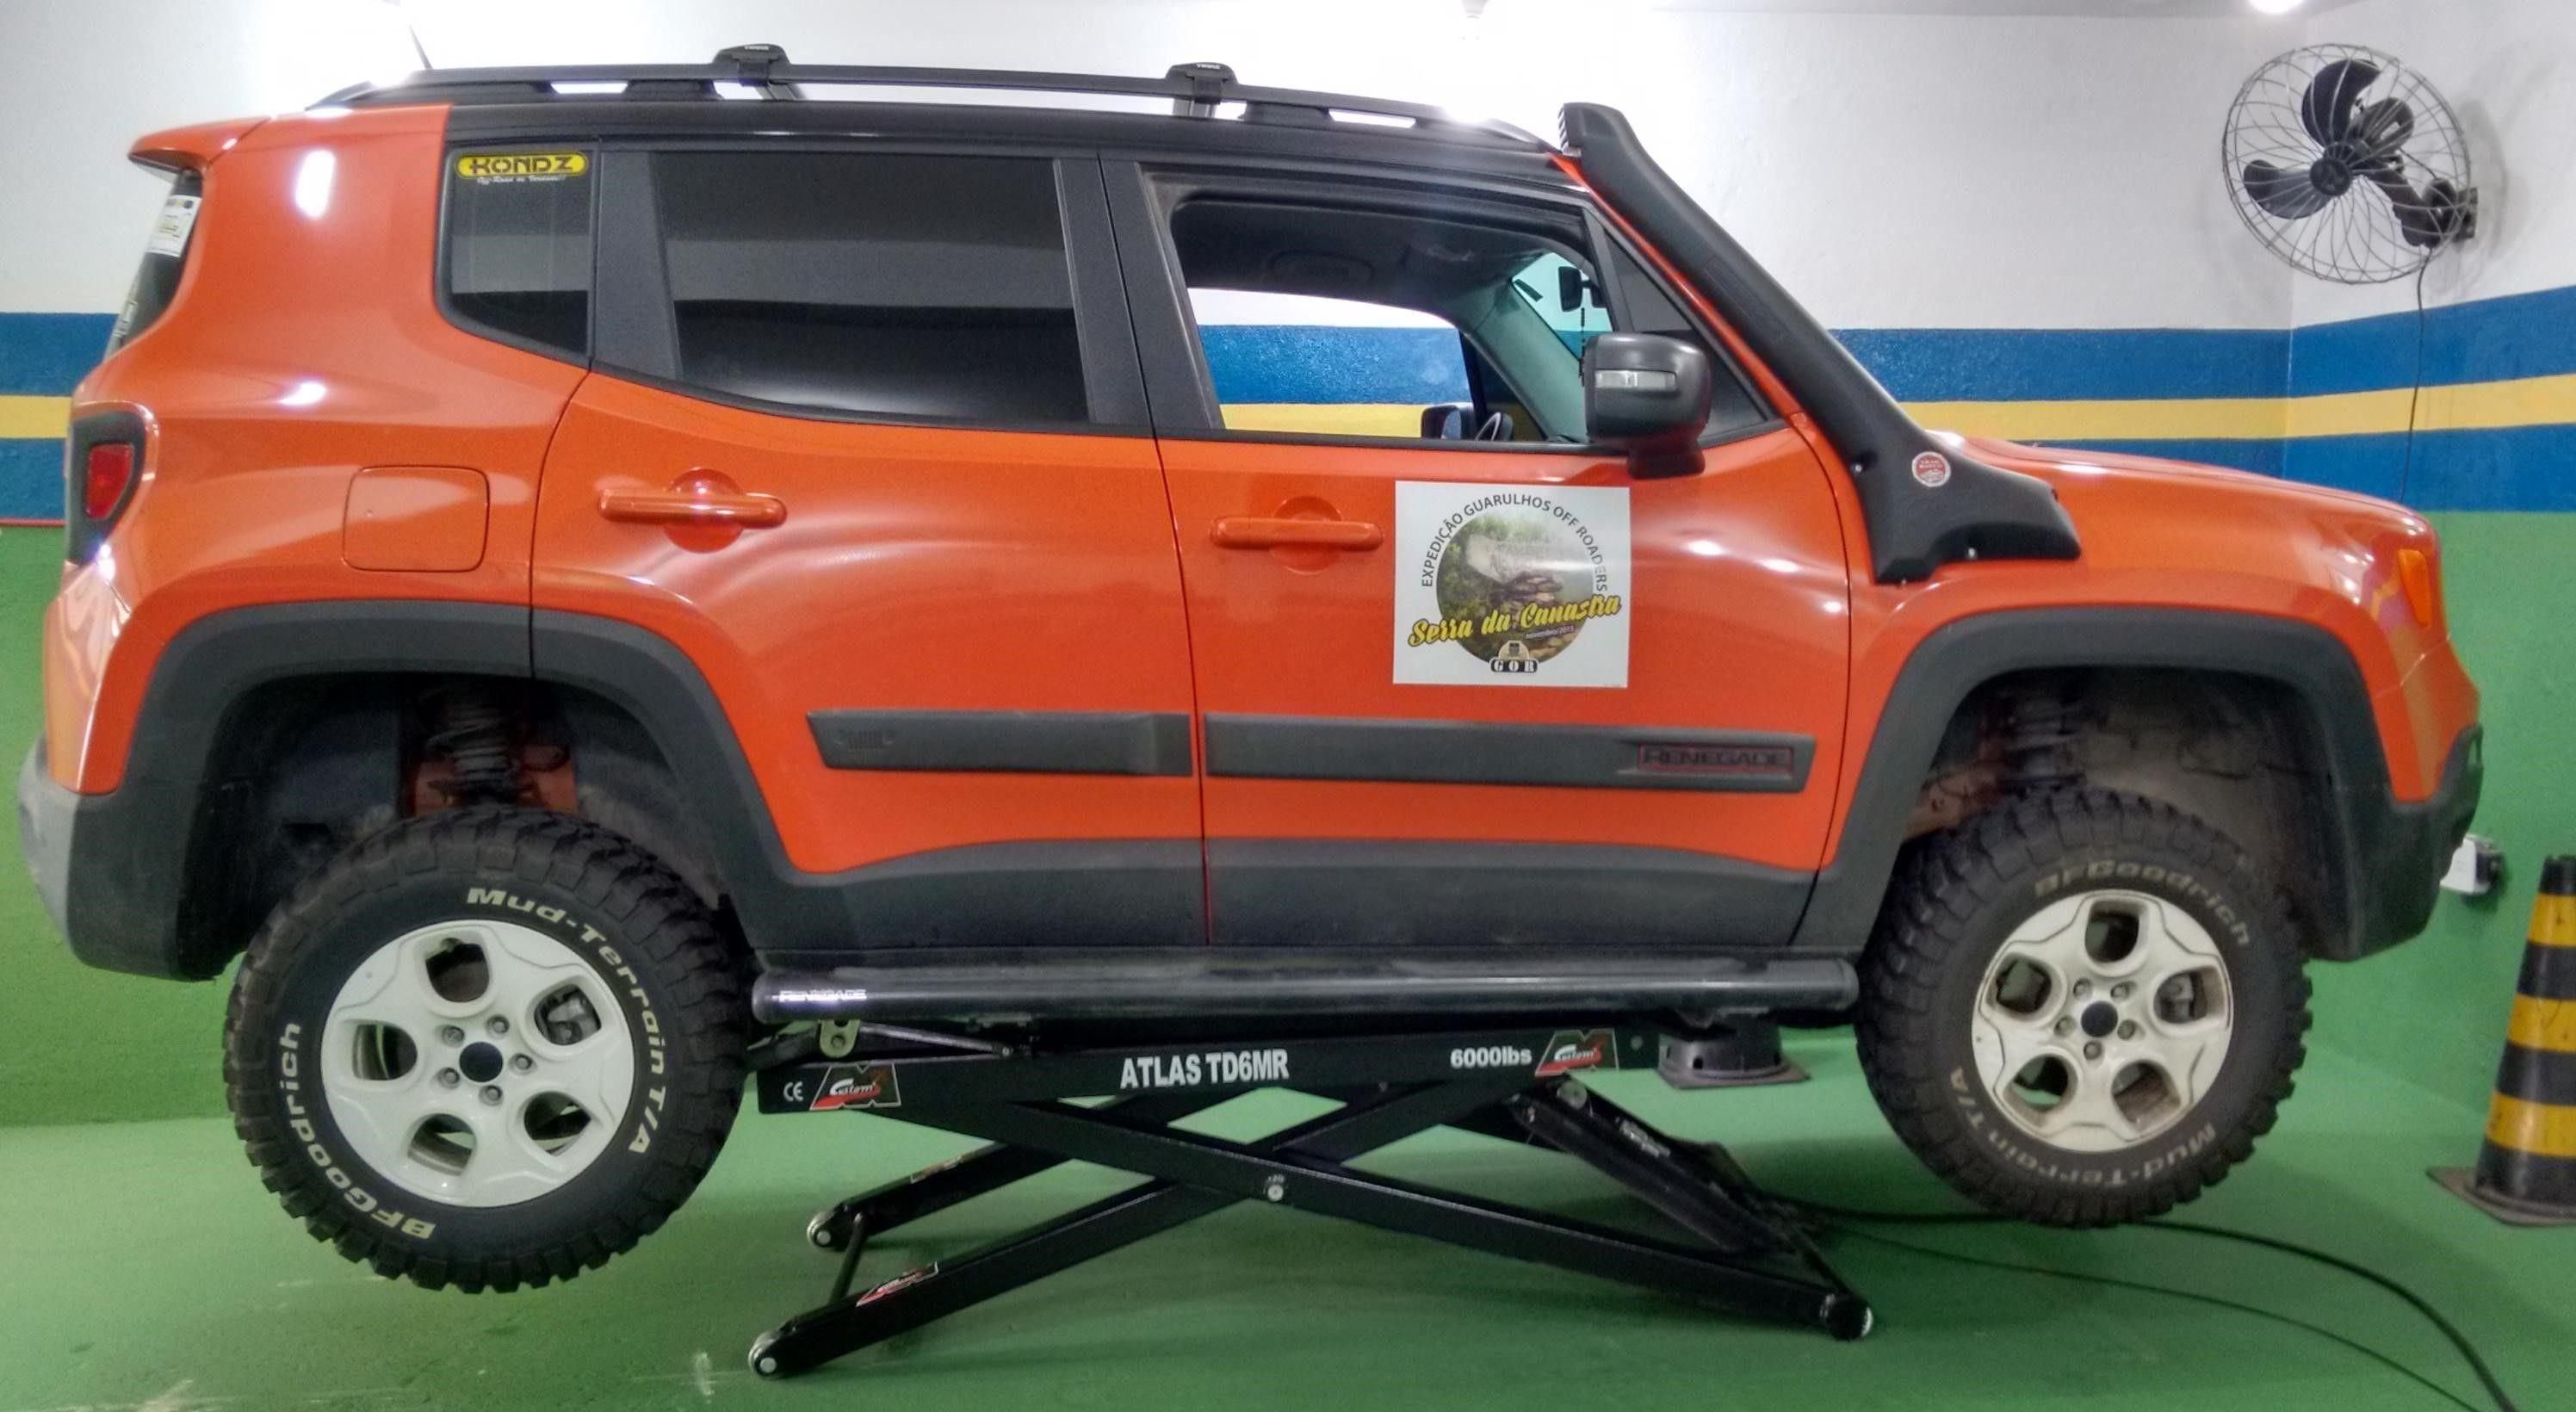 Snorkel Jeep Renegade Pinterest Install Jk Snorkeling Jeeps Offroad Dream Cars